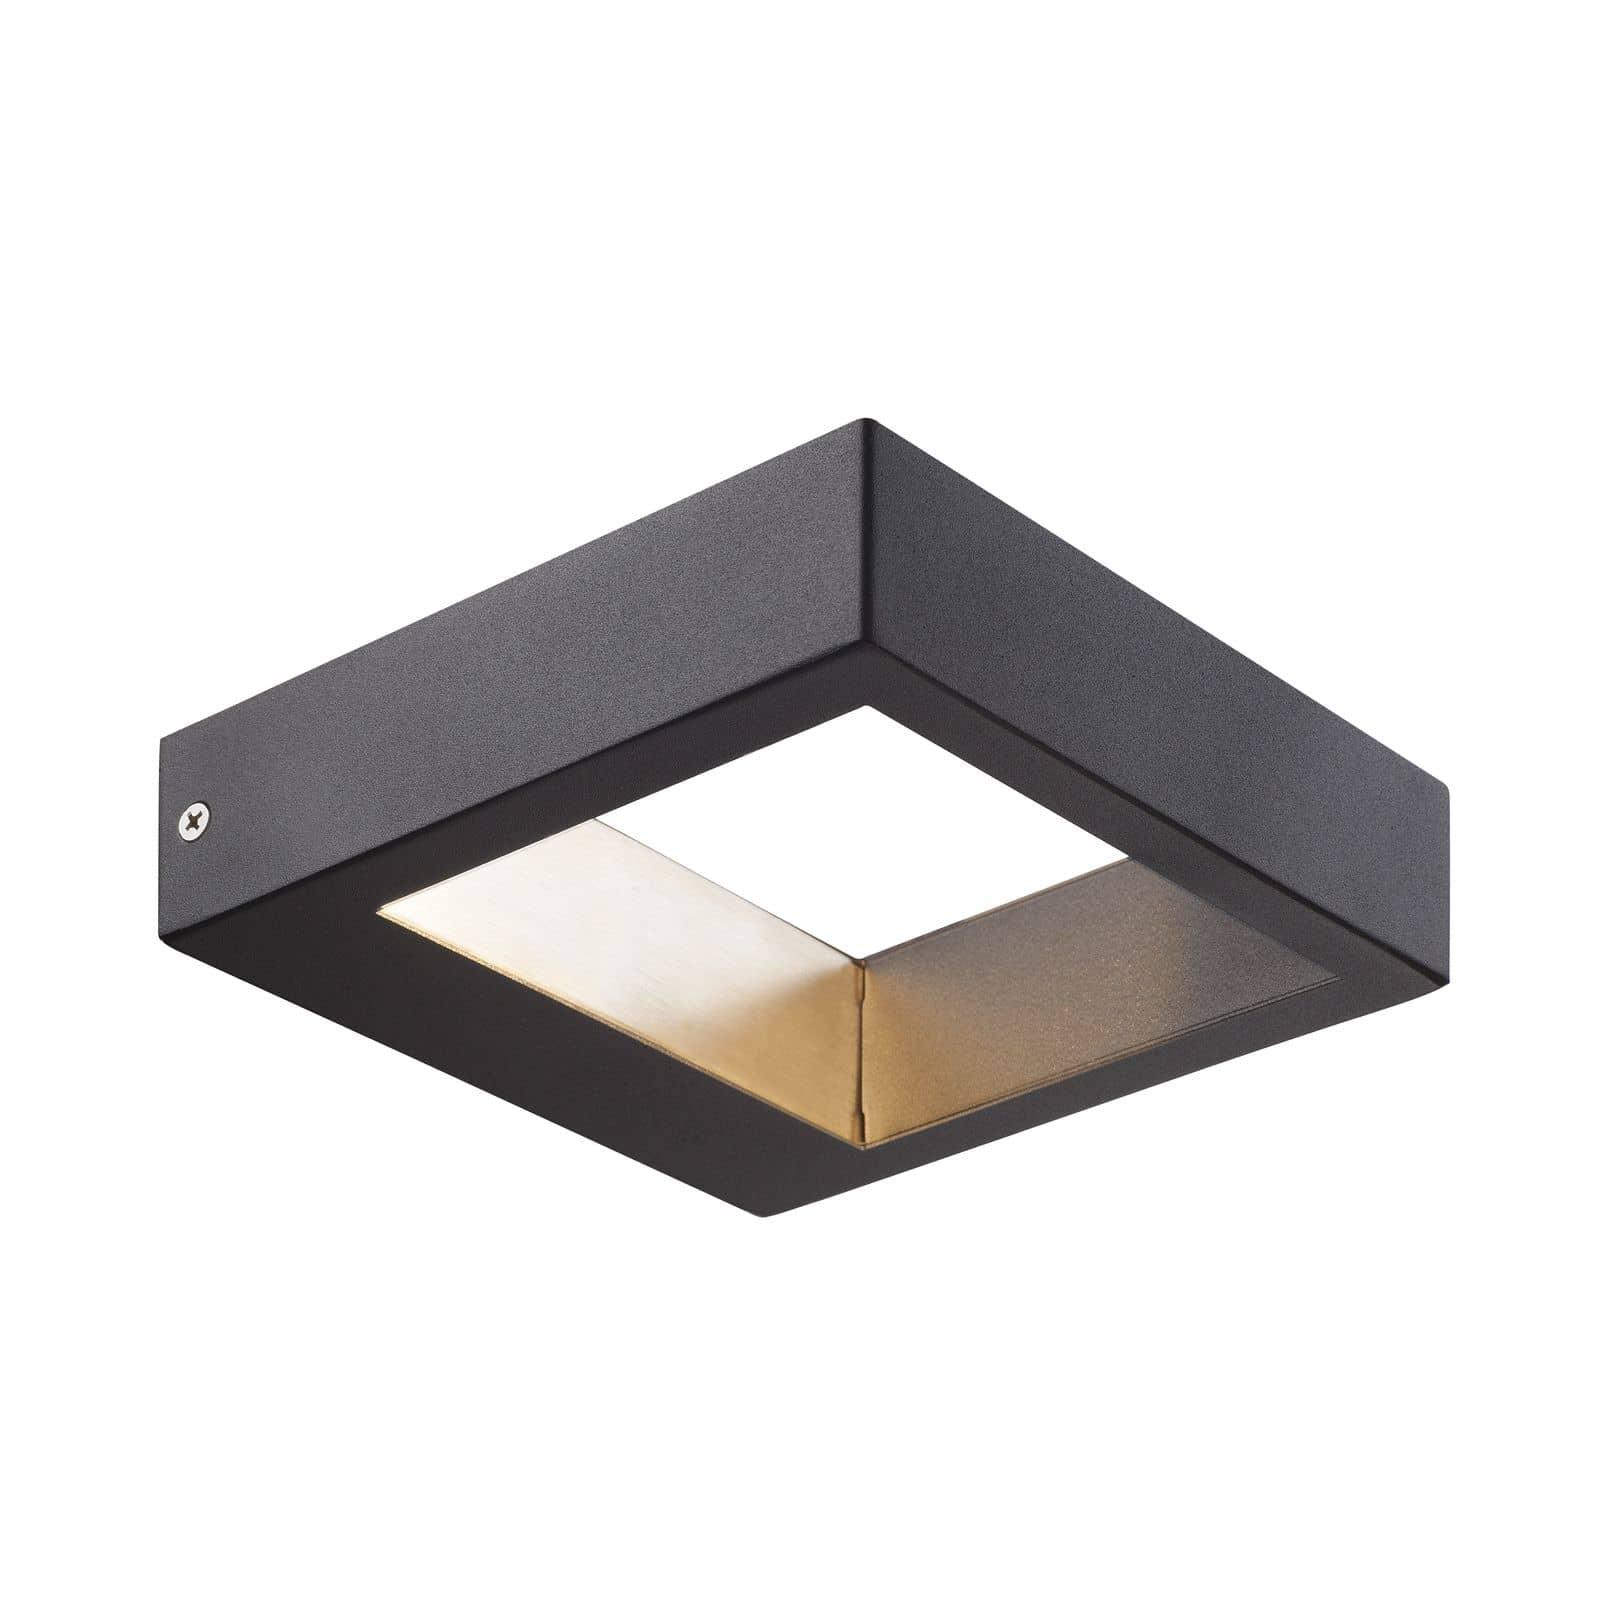 Nordlux 84111003 avon led wandleuchte 3w metall schwarz ip44 for Nordlux leuchten